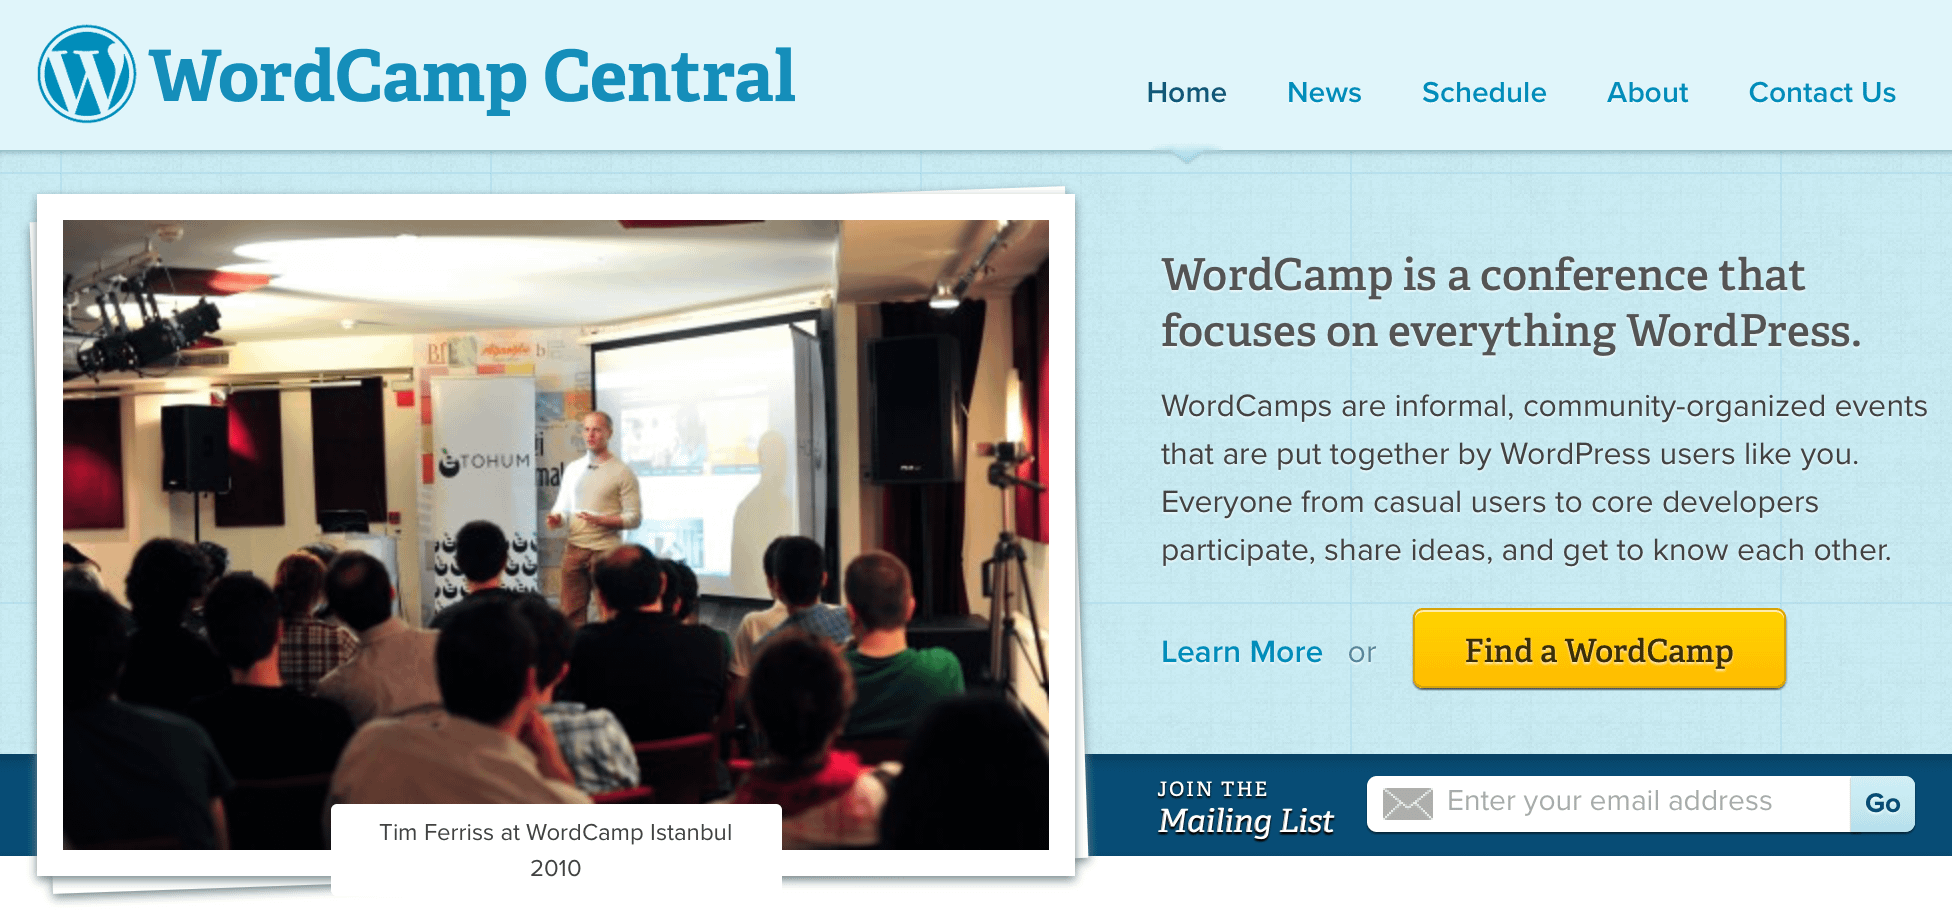 The WordCamp homepage.